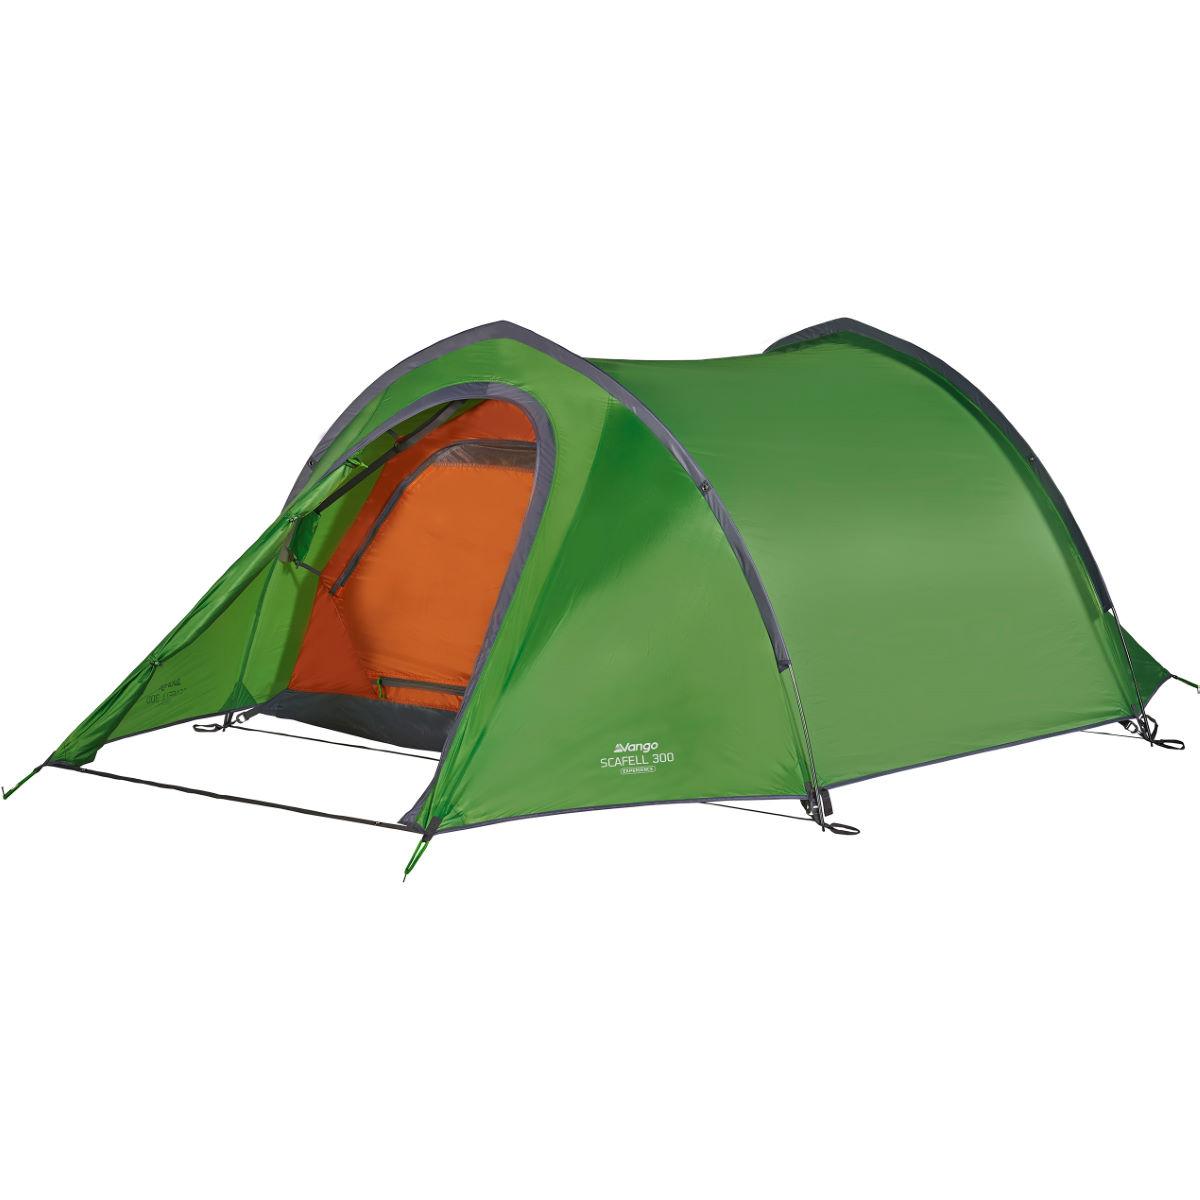 Vango Scafell 300 Zelt, 3-Personen / 2,48 kg / Wassersäule 3000mm bzw. 6000mm / Packmaß 48 x 17 cm